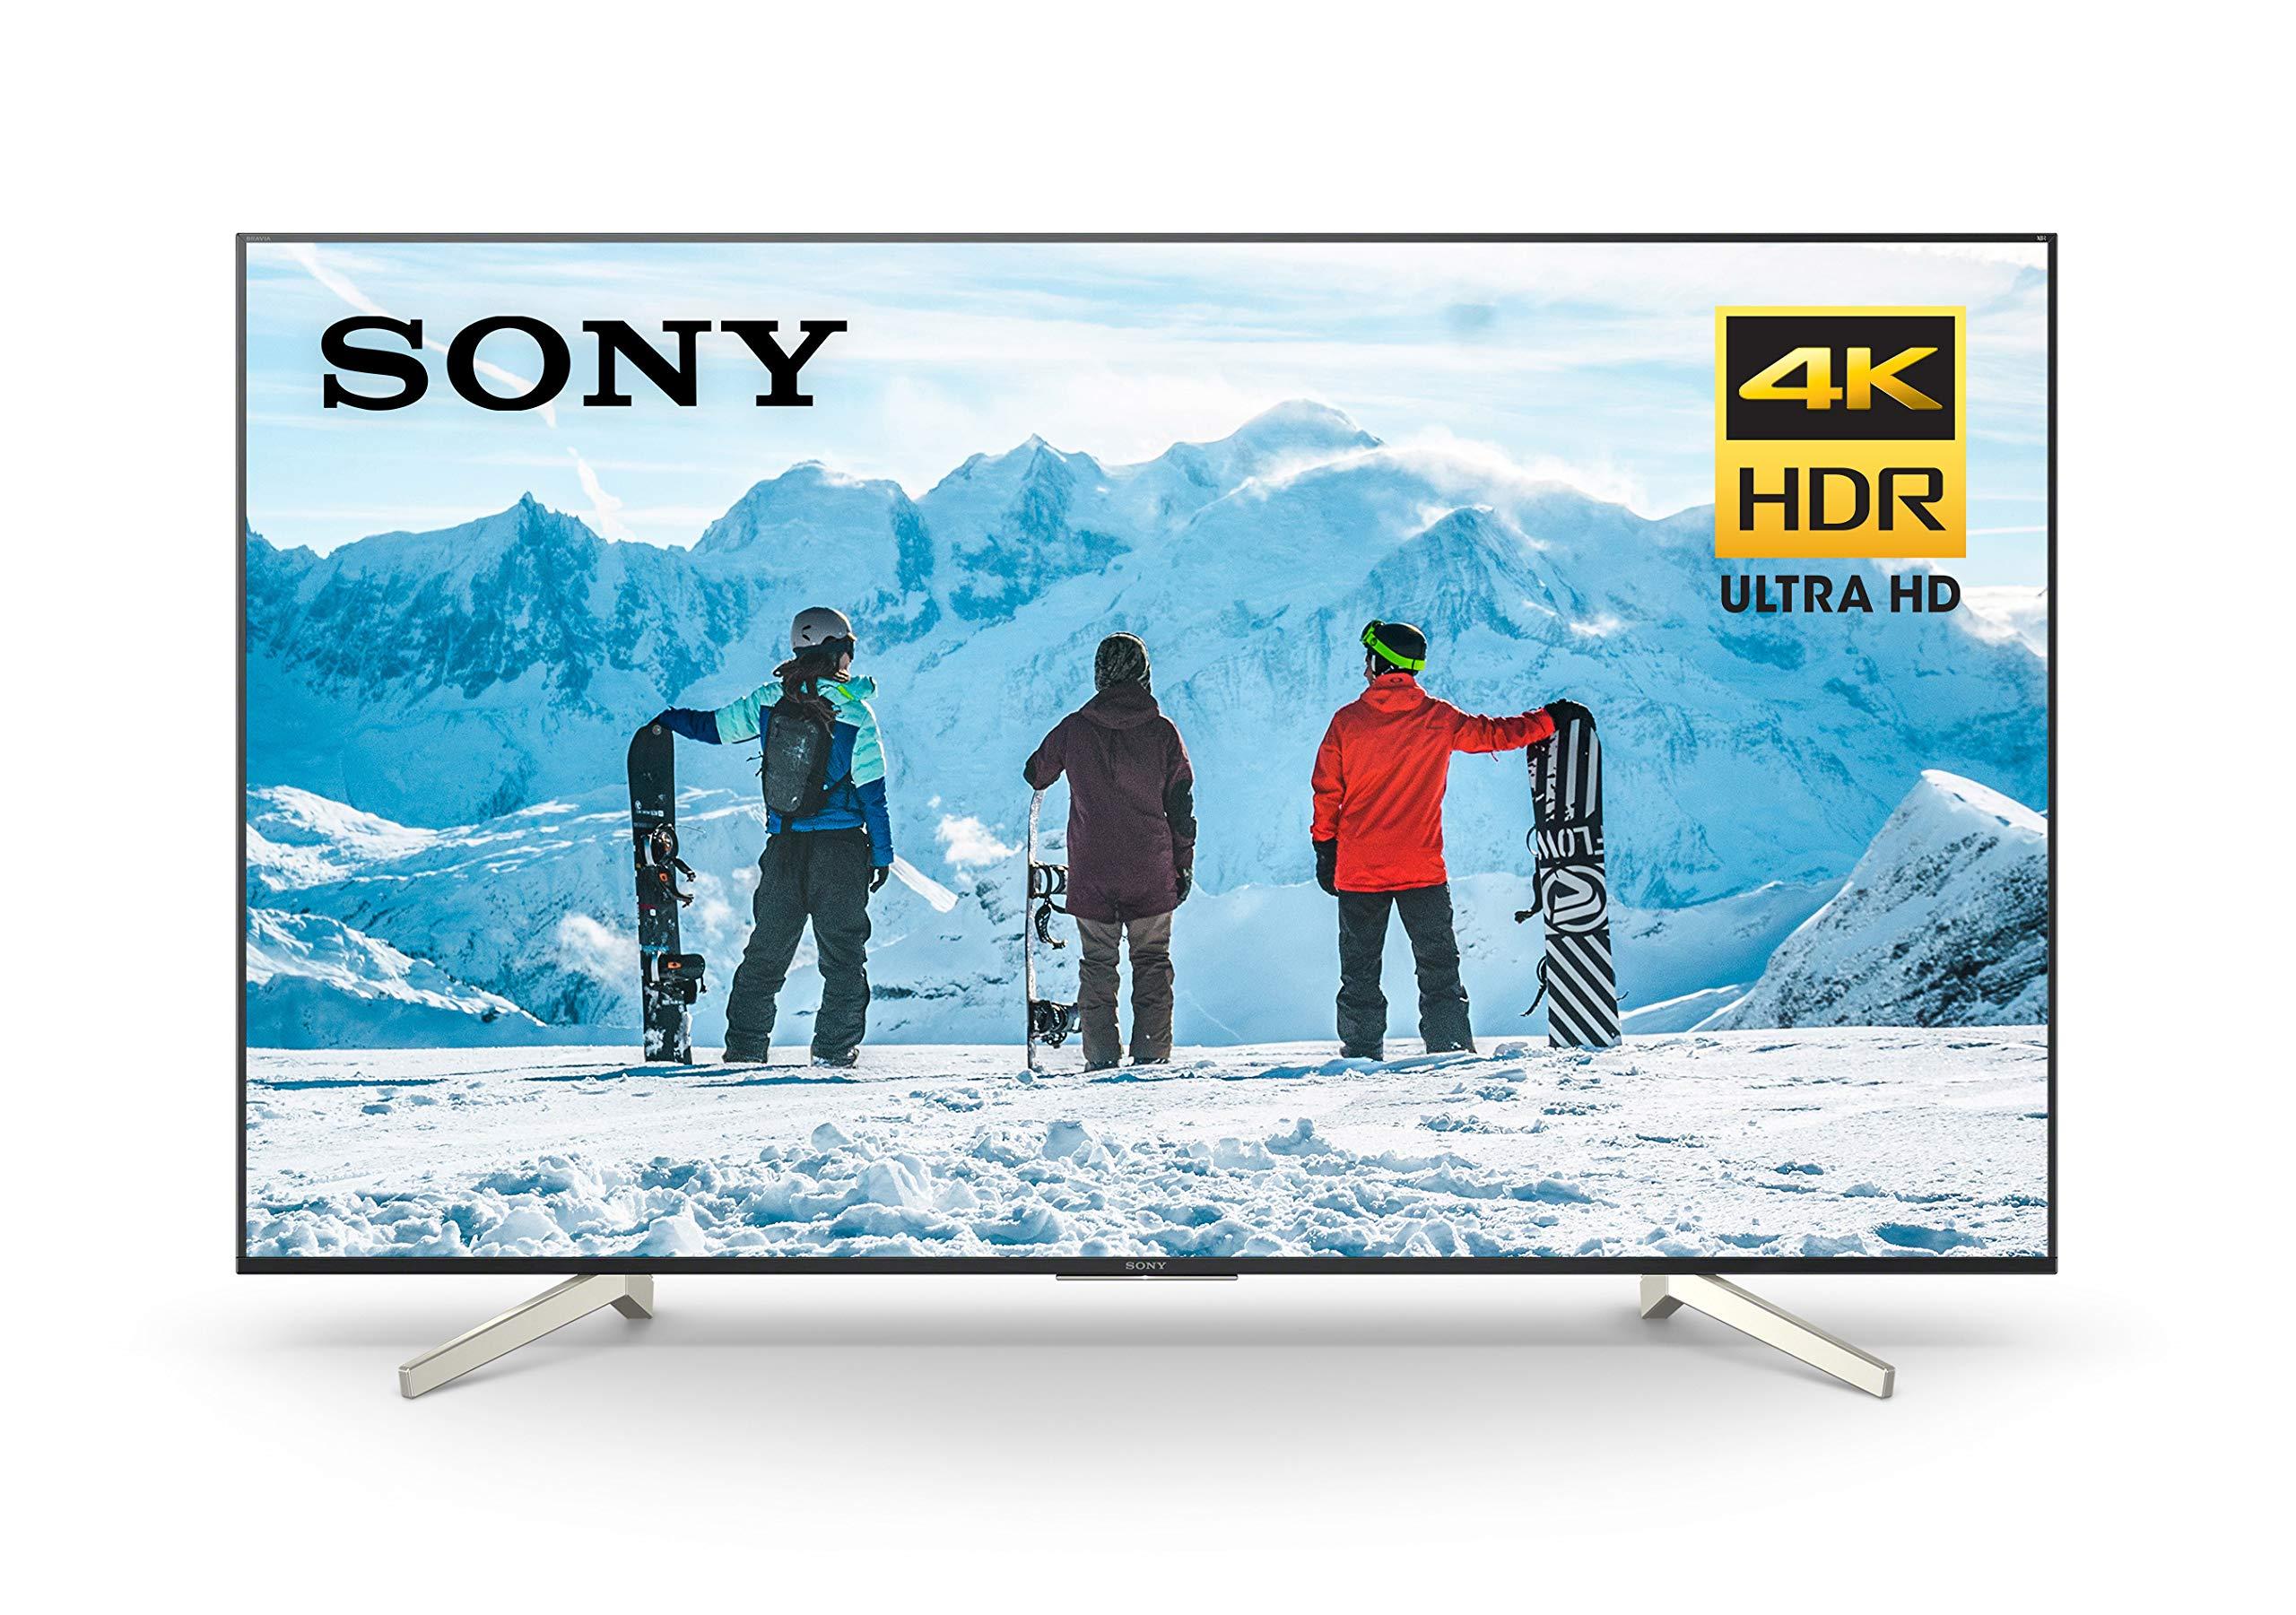 Sony XBR65X850F 4K Ultra HD Smart LED TV (2018 Model) 1